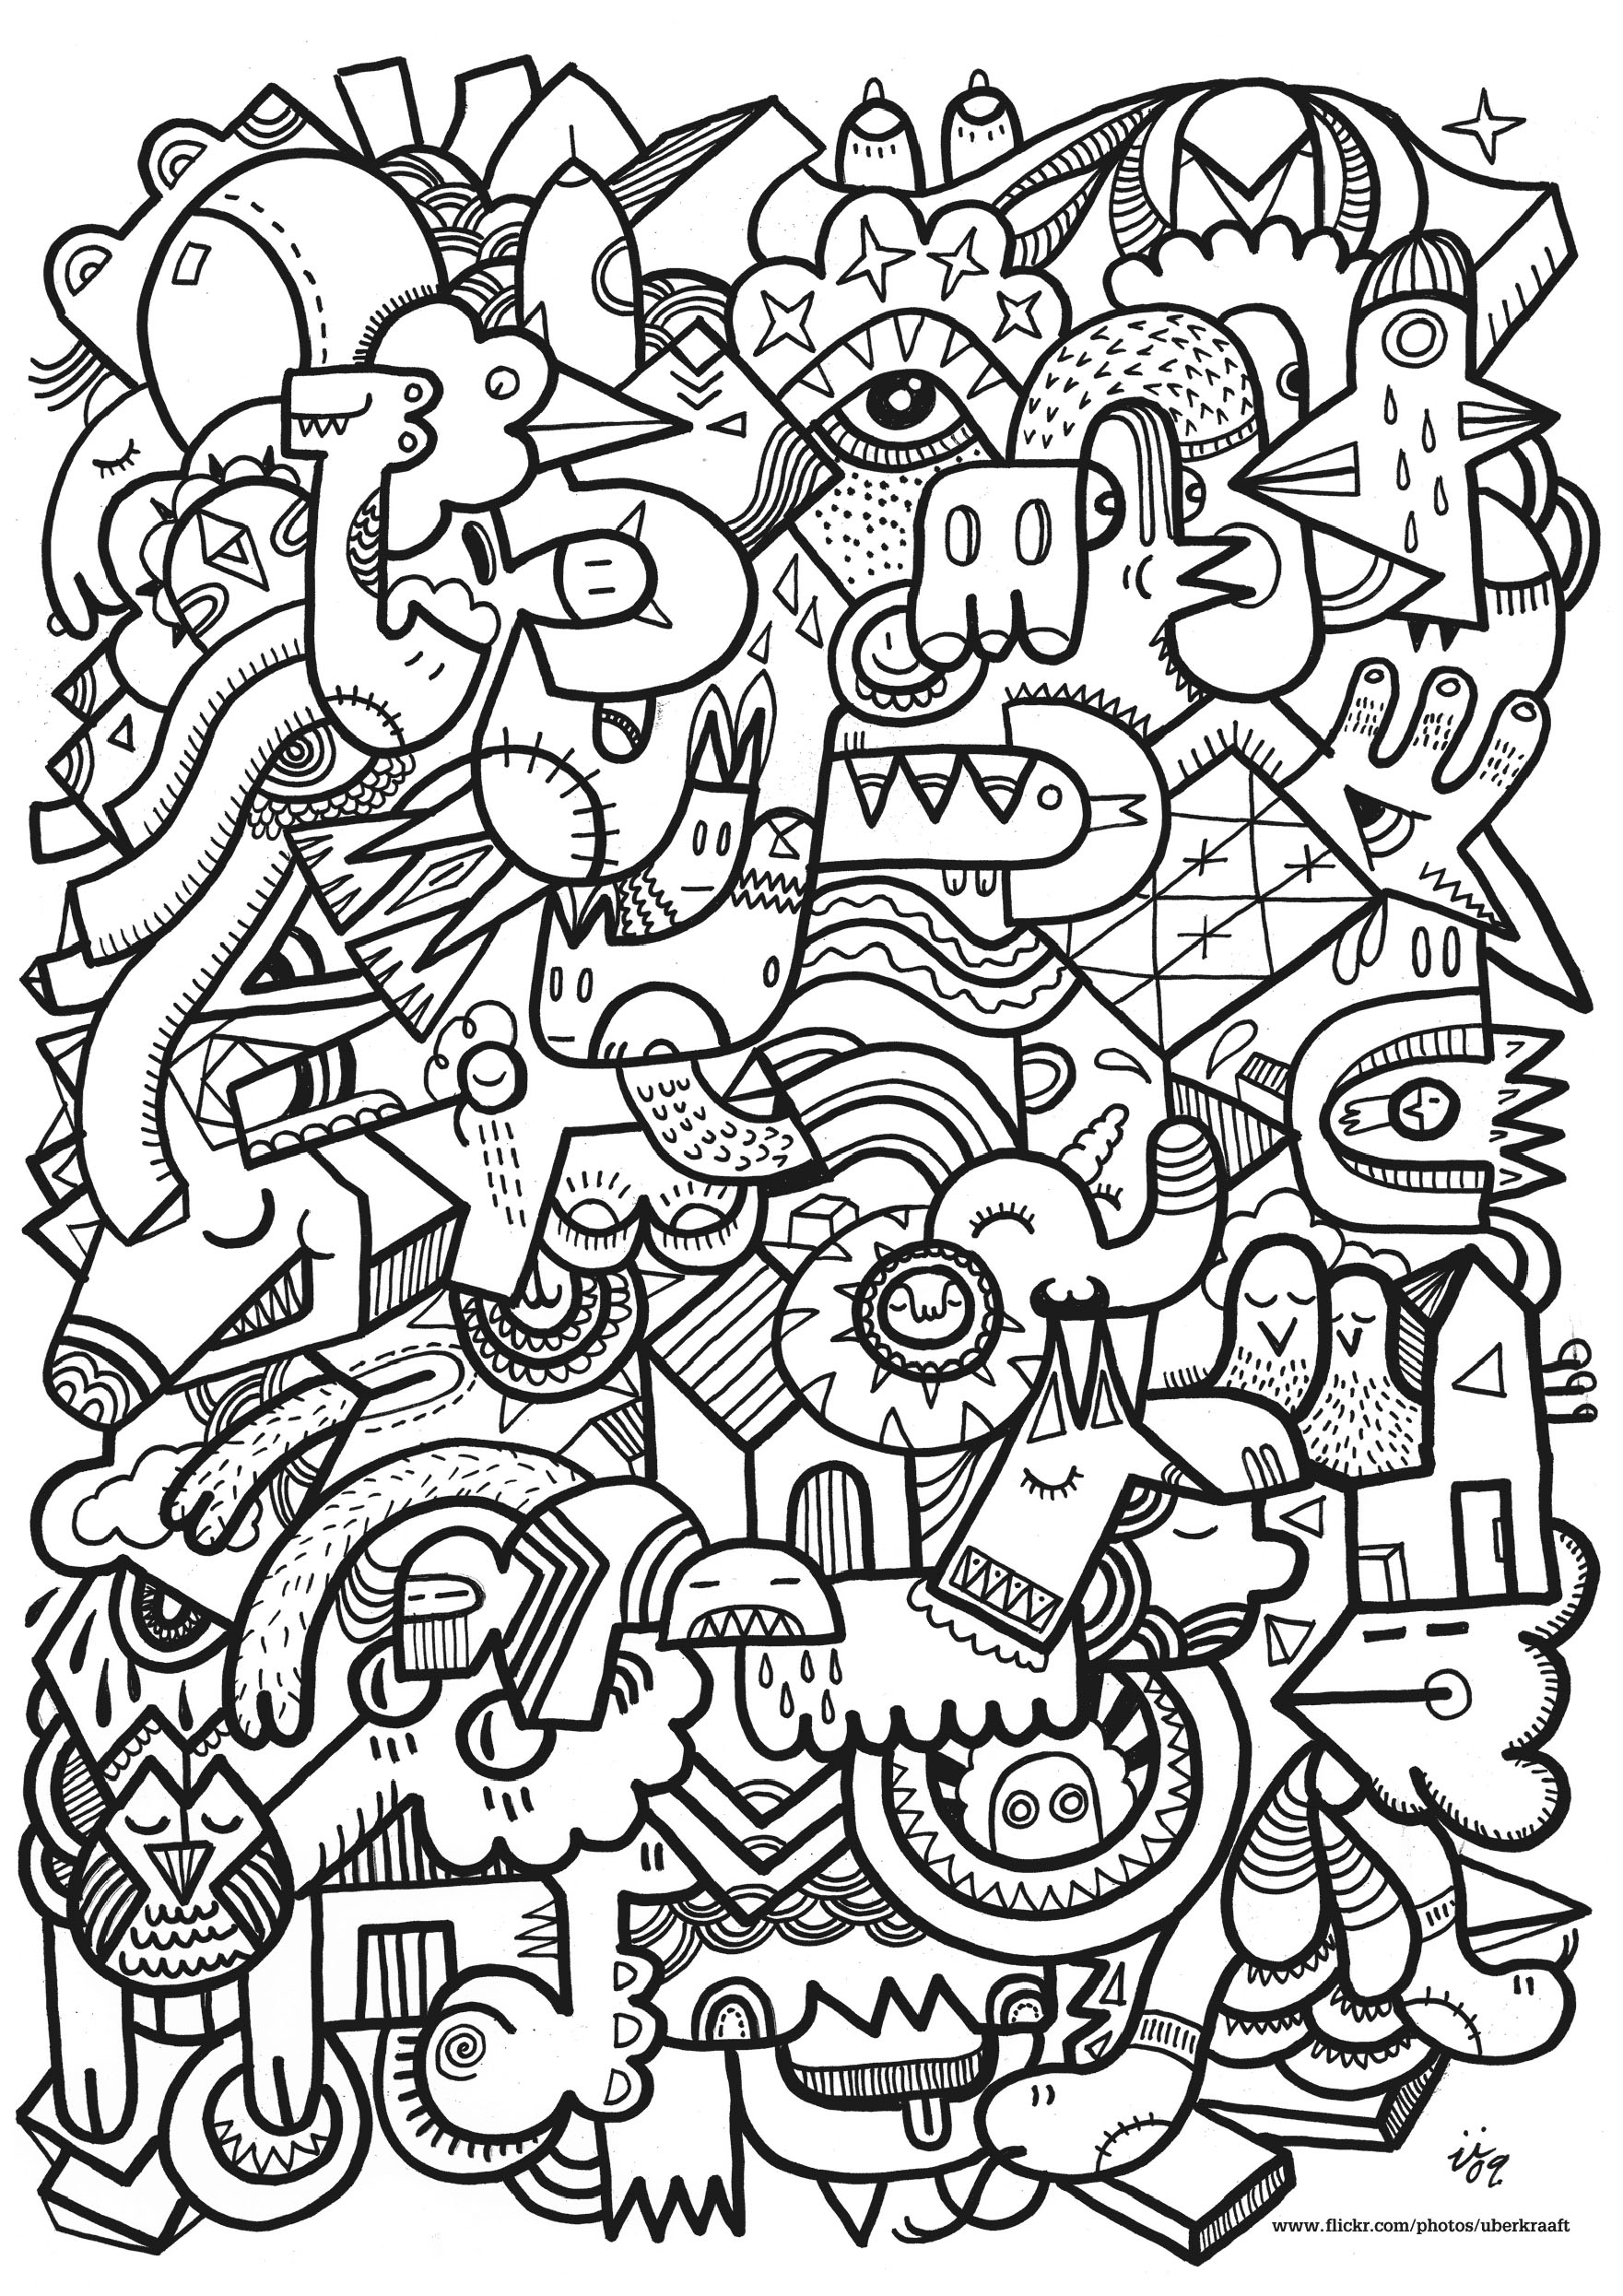 Doodle Art Doodling 16 Doodle Art Doodling Adult